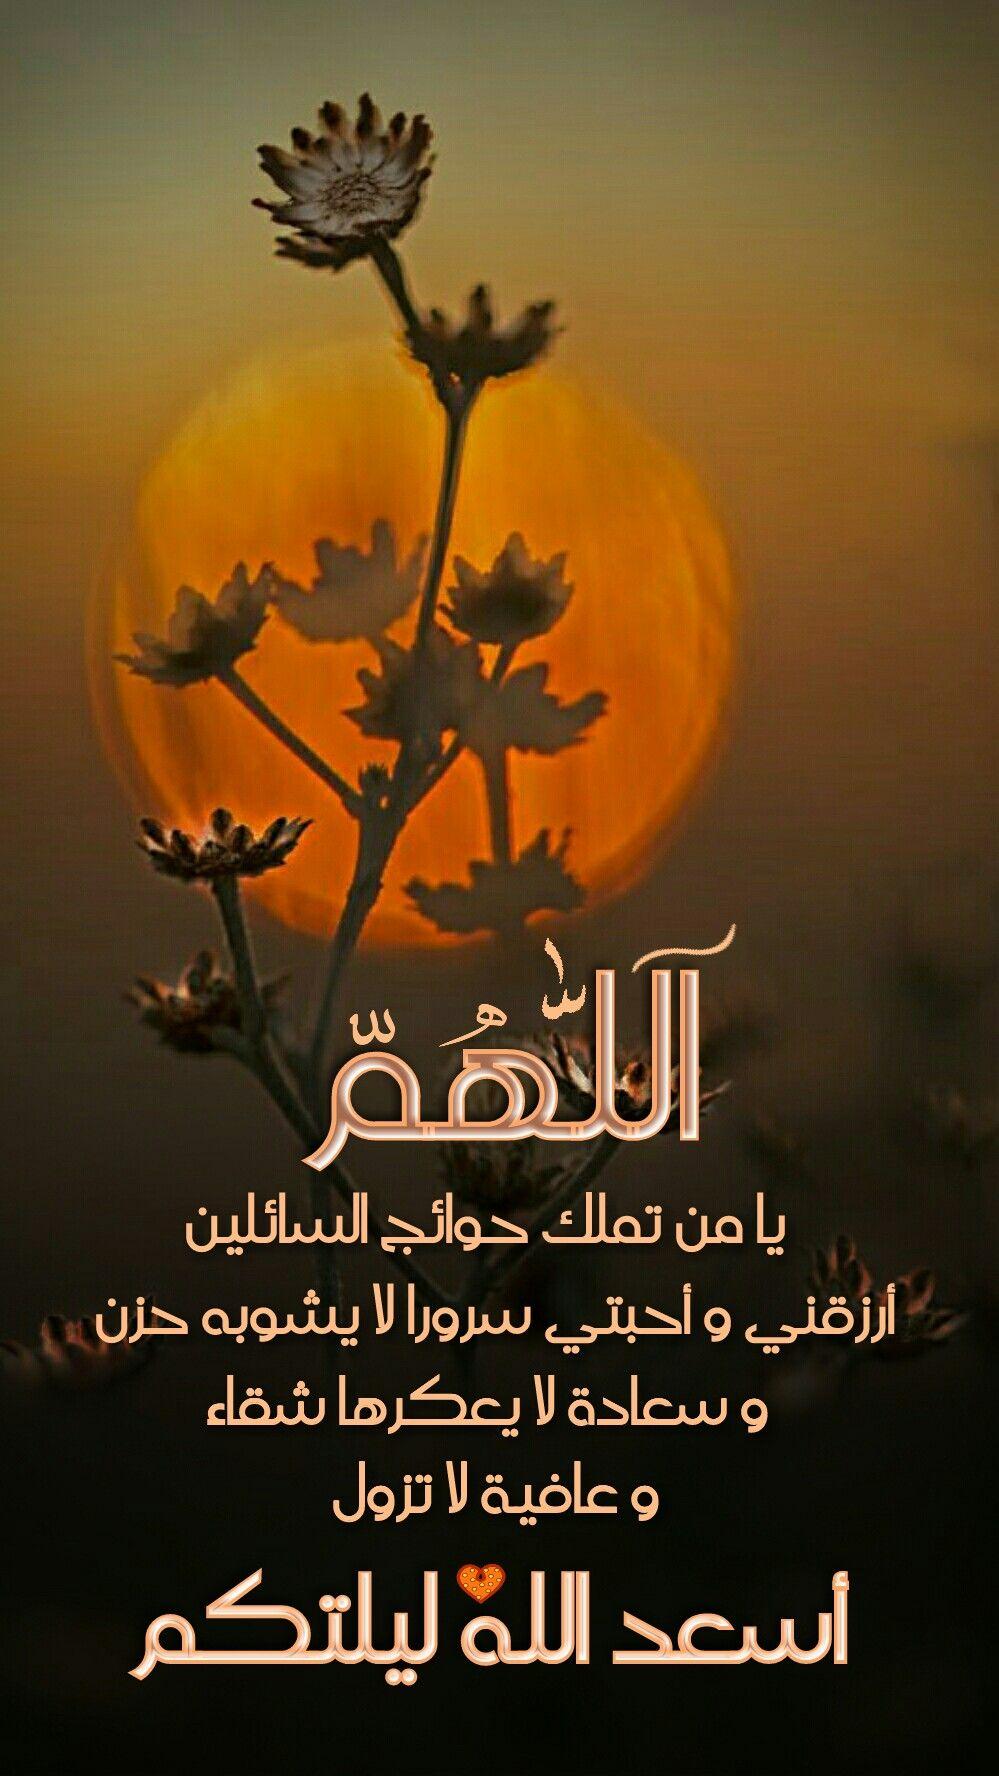 Pin By Vida Azar On صباحيات و مسائيات Good Morning Arabic Good Morning Gif Morning Images